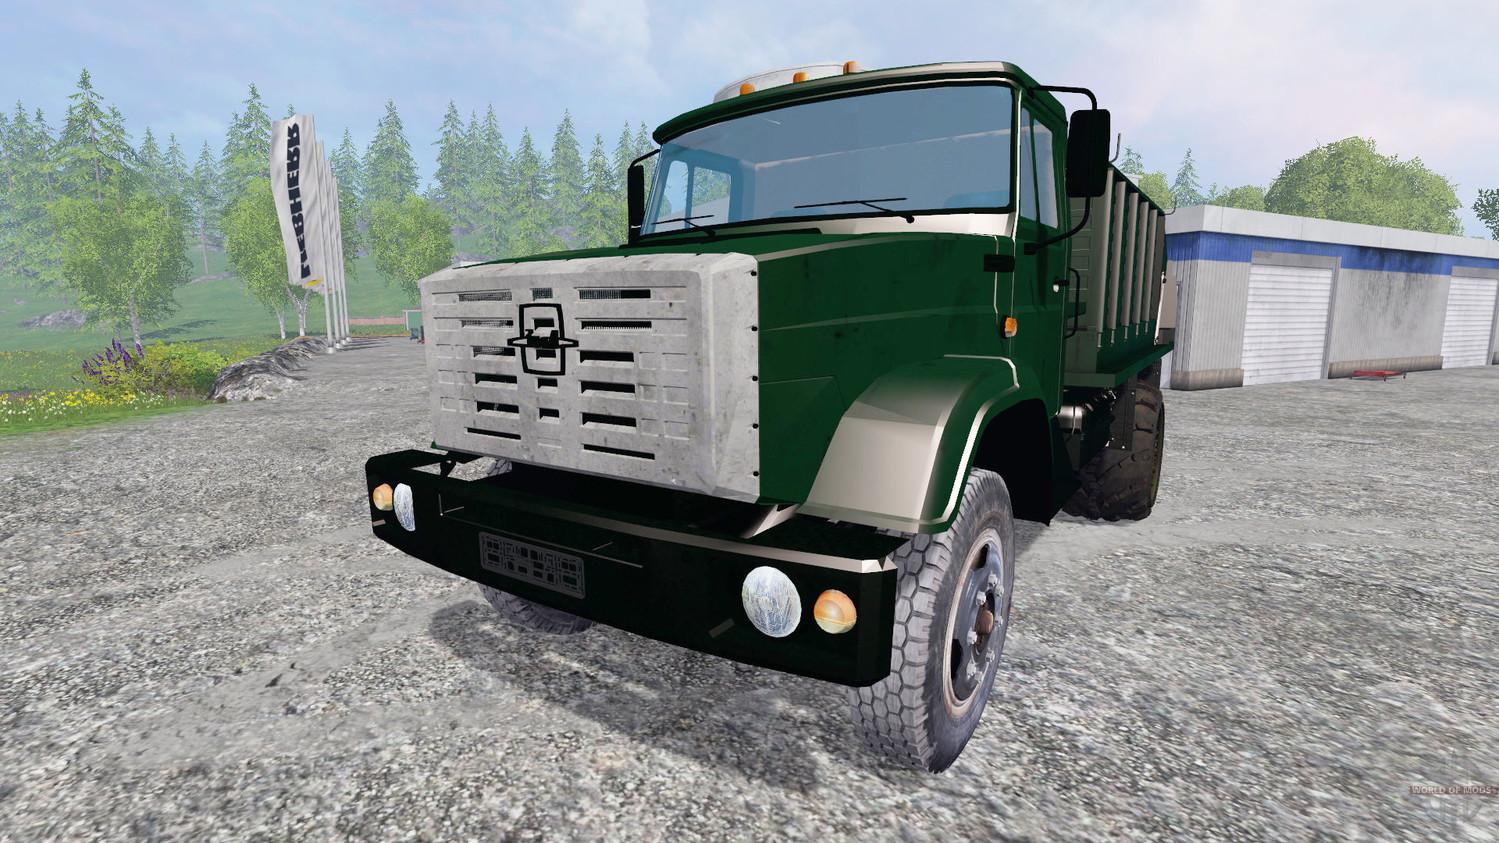 Грузовики для Мод кормораздатчика Зил-45065 v2.0 для Farming Simulator 2015